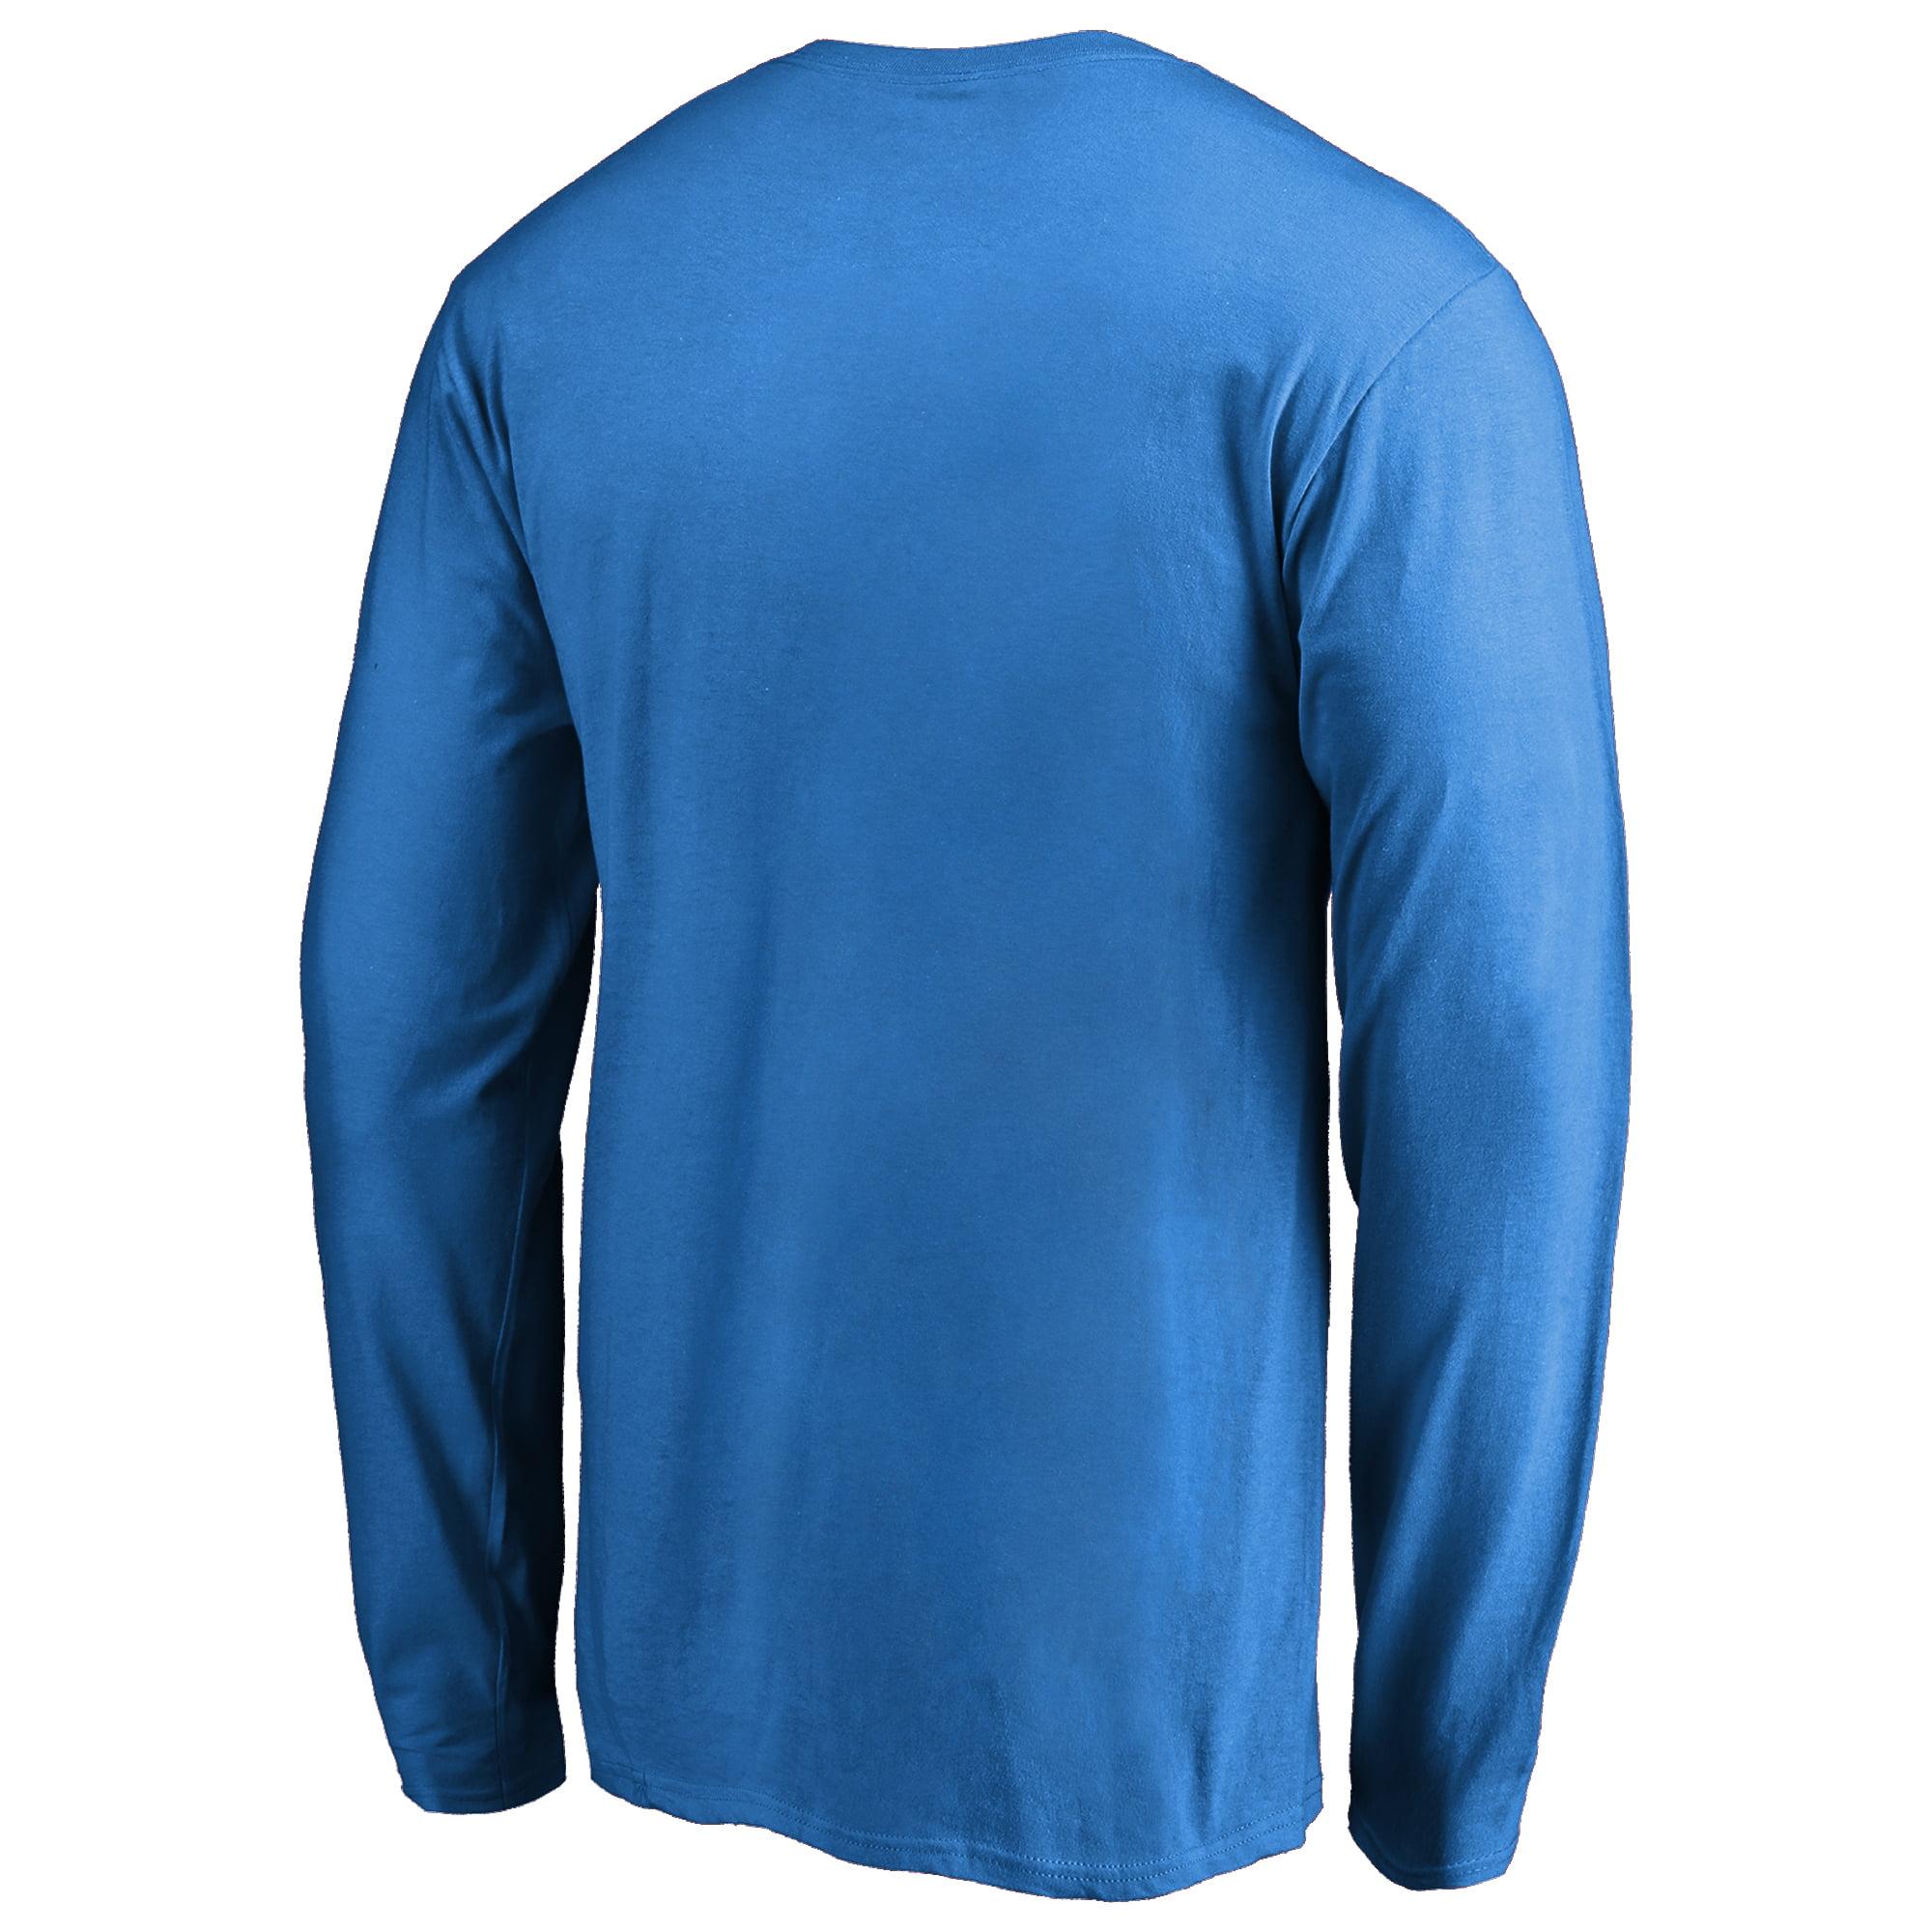 f054abc653a Detroit Lions NFL Pro Line by Fanatics Branded Vintage Collection Victory  Arch Long Sleeve T-Shirt - Blue - Walmart.com